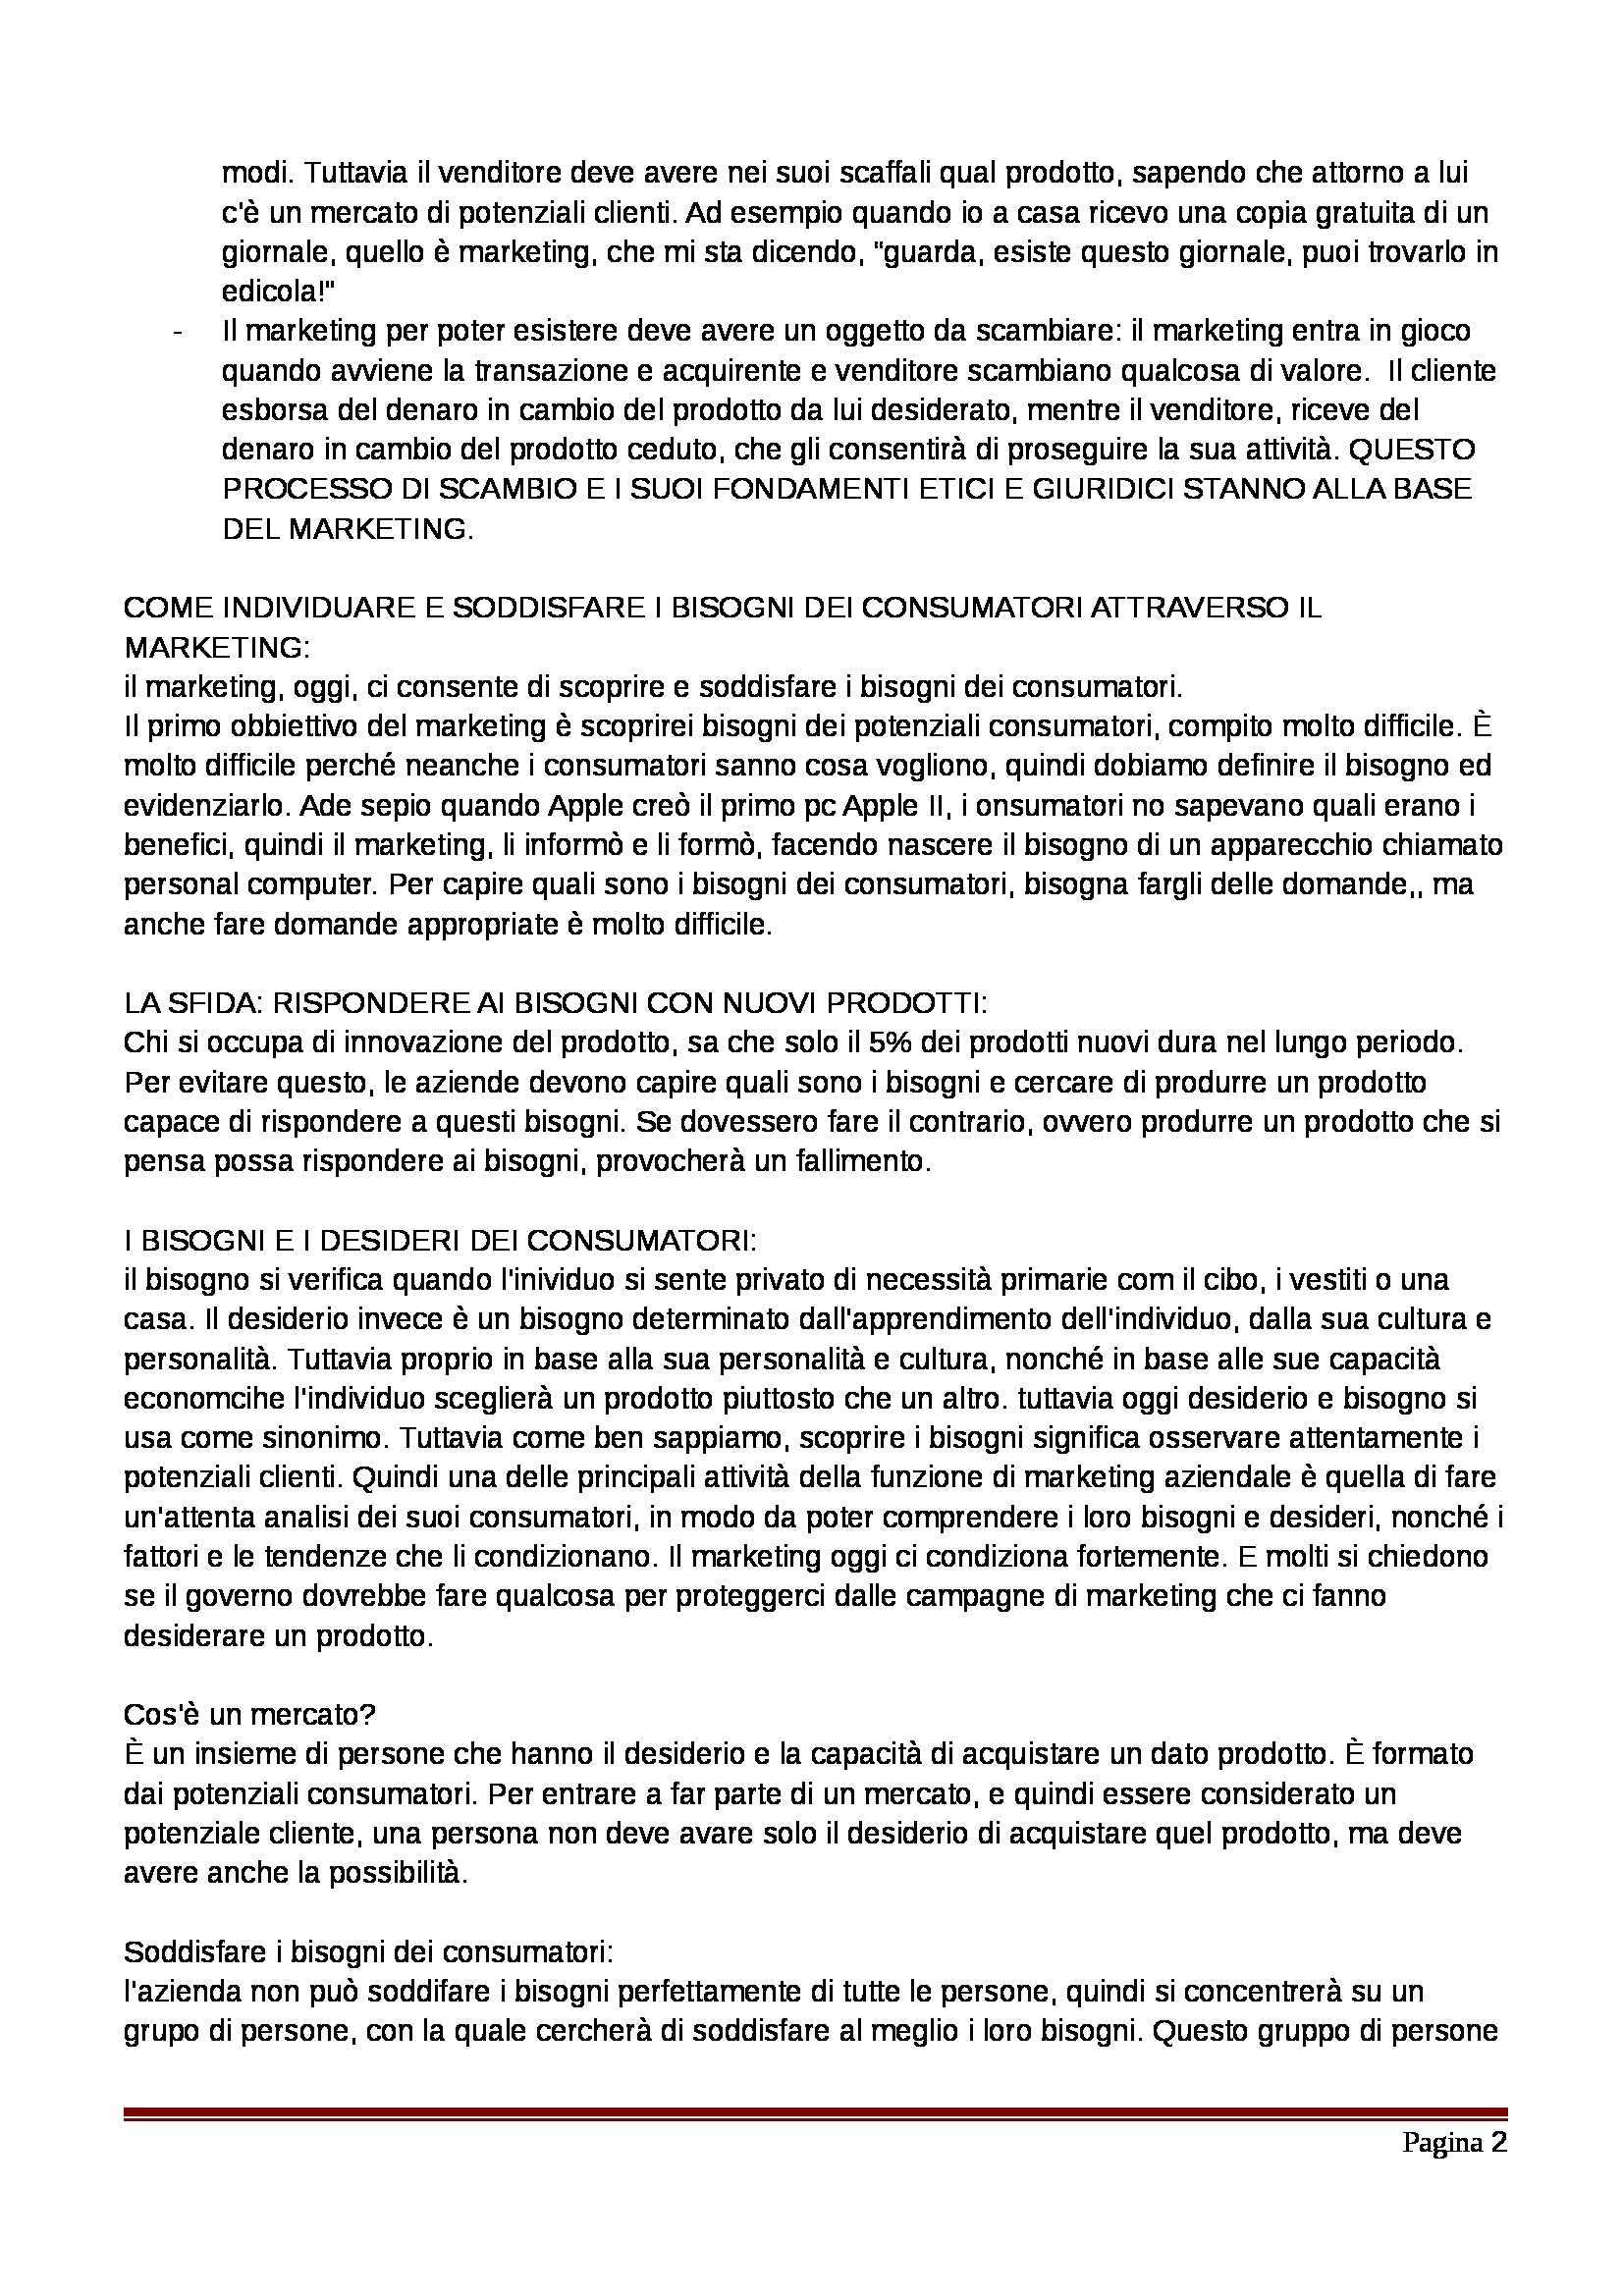 Riassunto esame Marketing, prof. Pellegrini, libro consigliato Marketing, Kerin, Hartley, Rudelius, Pellegrini Pag. 2